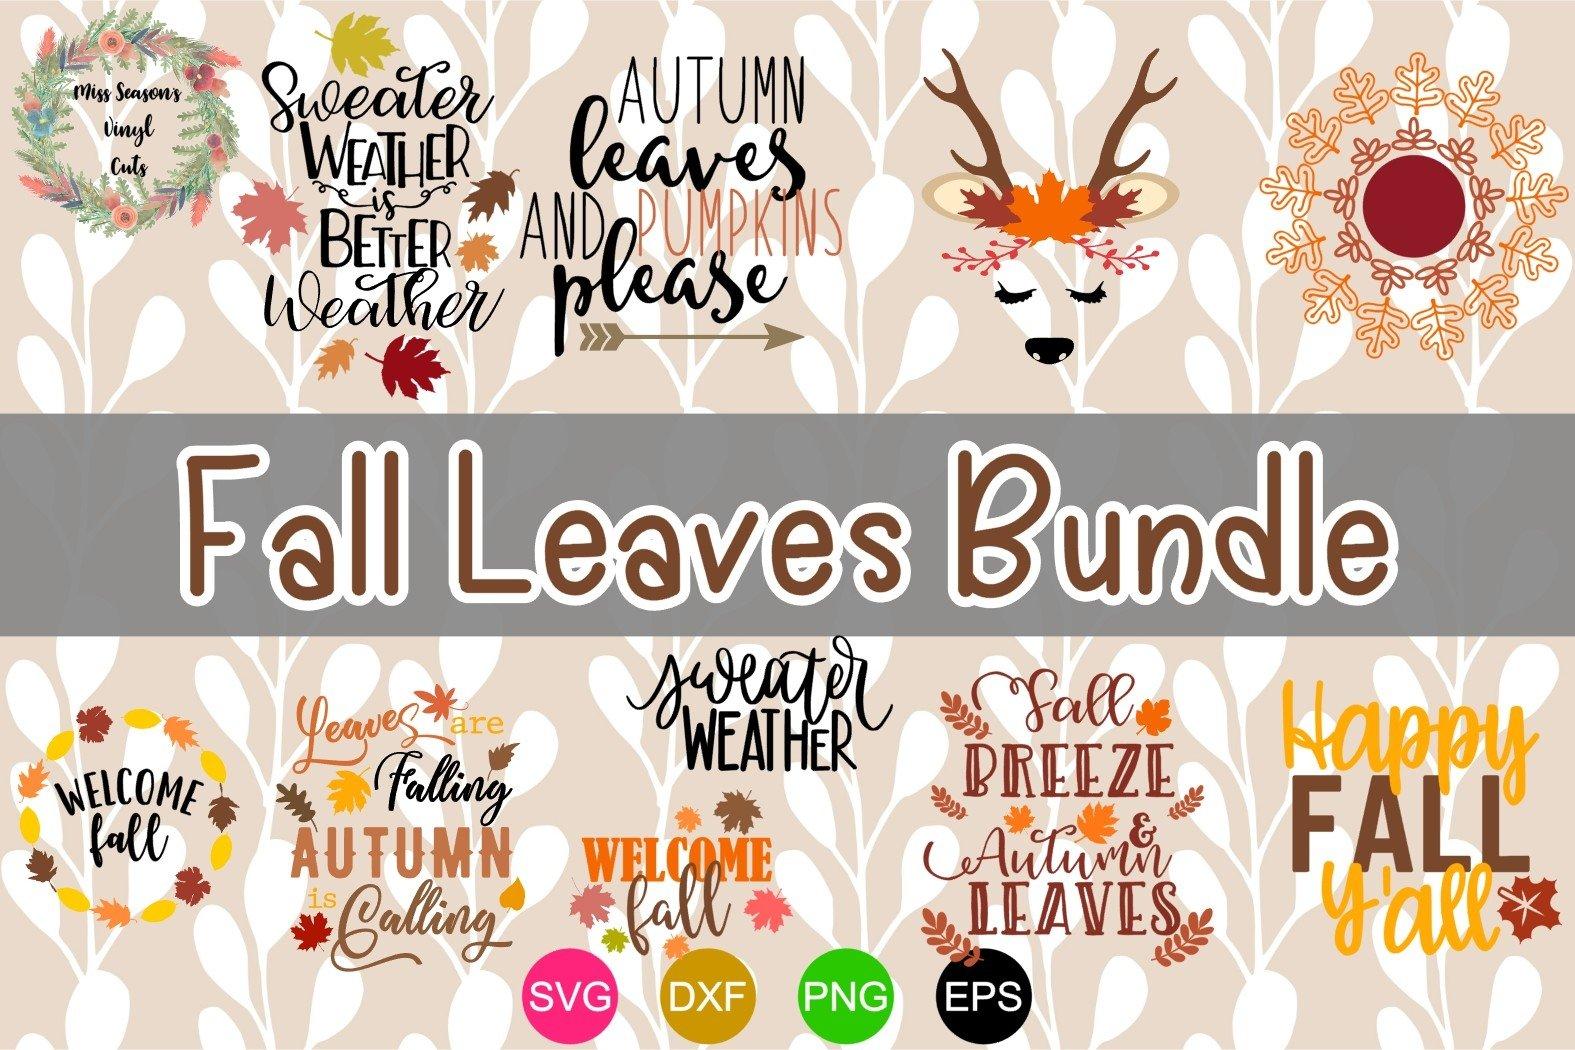 Fall Leaves Bundle Svg Dxf Eps Png 10 Designs 332385 Cut Files Design Bundles